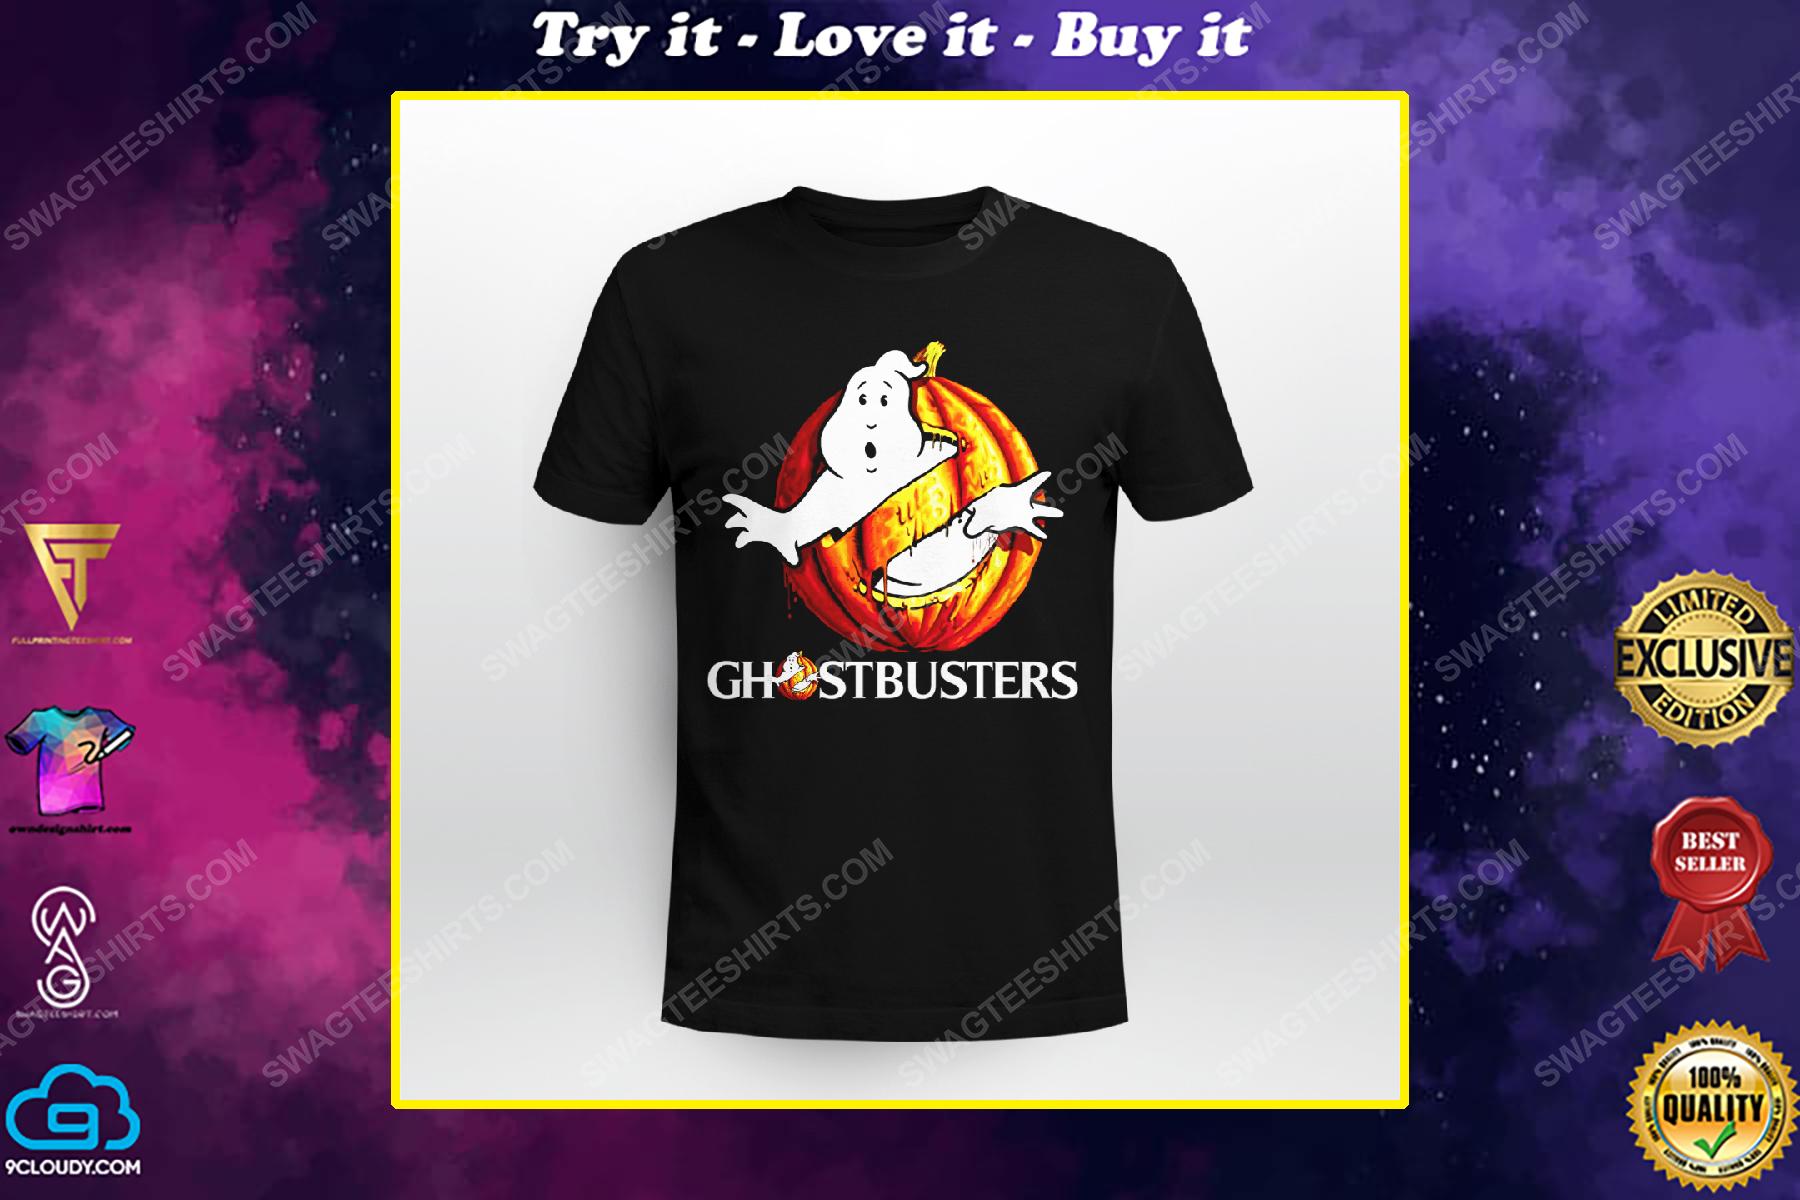 Ghostbusters with halloween pumpkin shirt